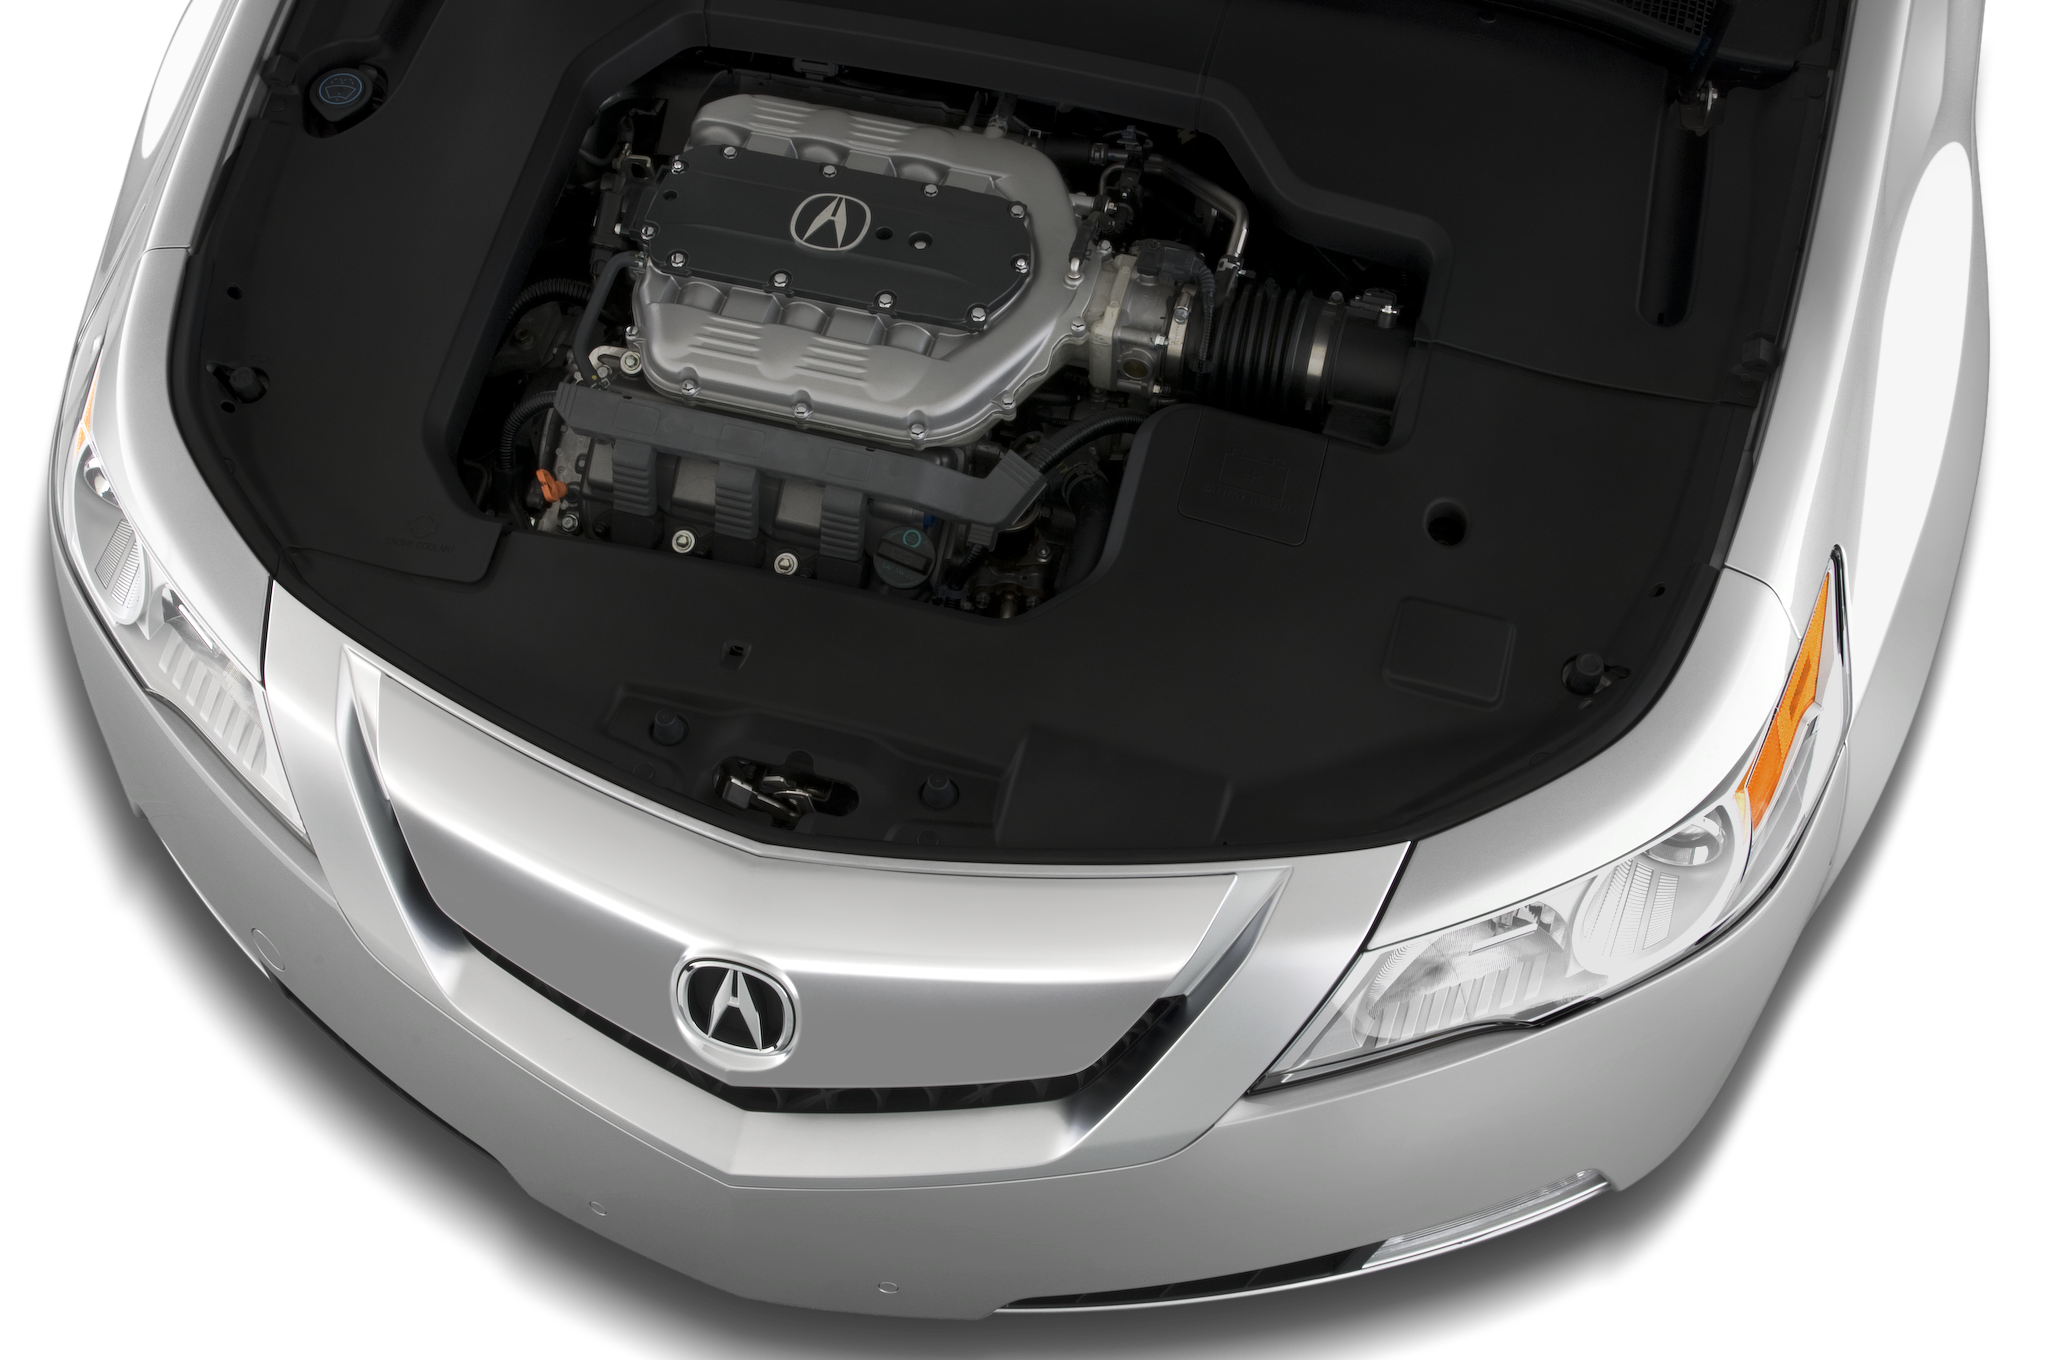 2010 Acura Tl Sh Awd Vs Audi S4 Sedan And Sports Coupe 2006 Headlamp Wiring Harness 5 50